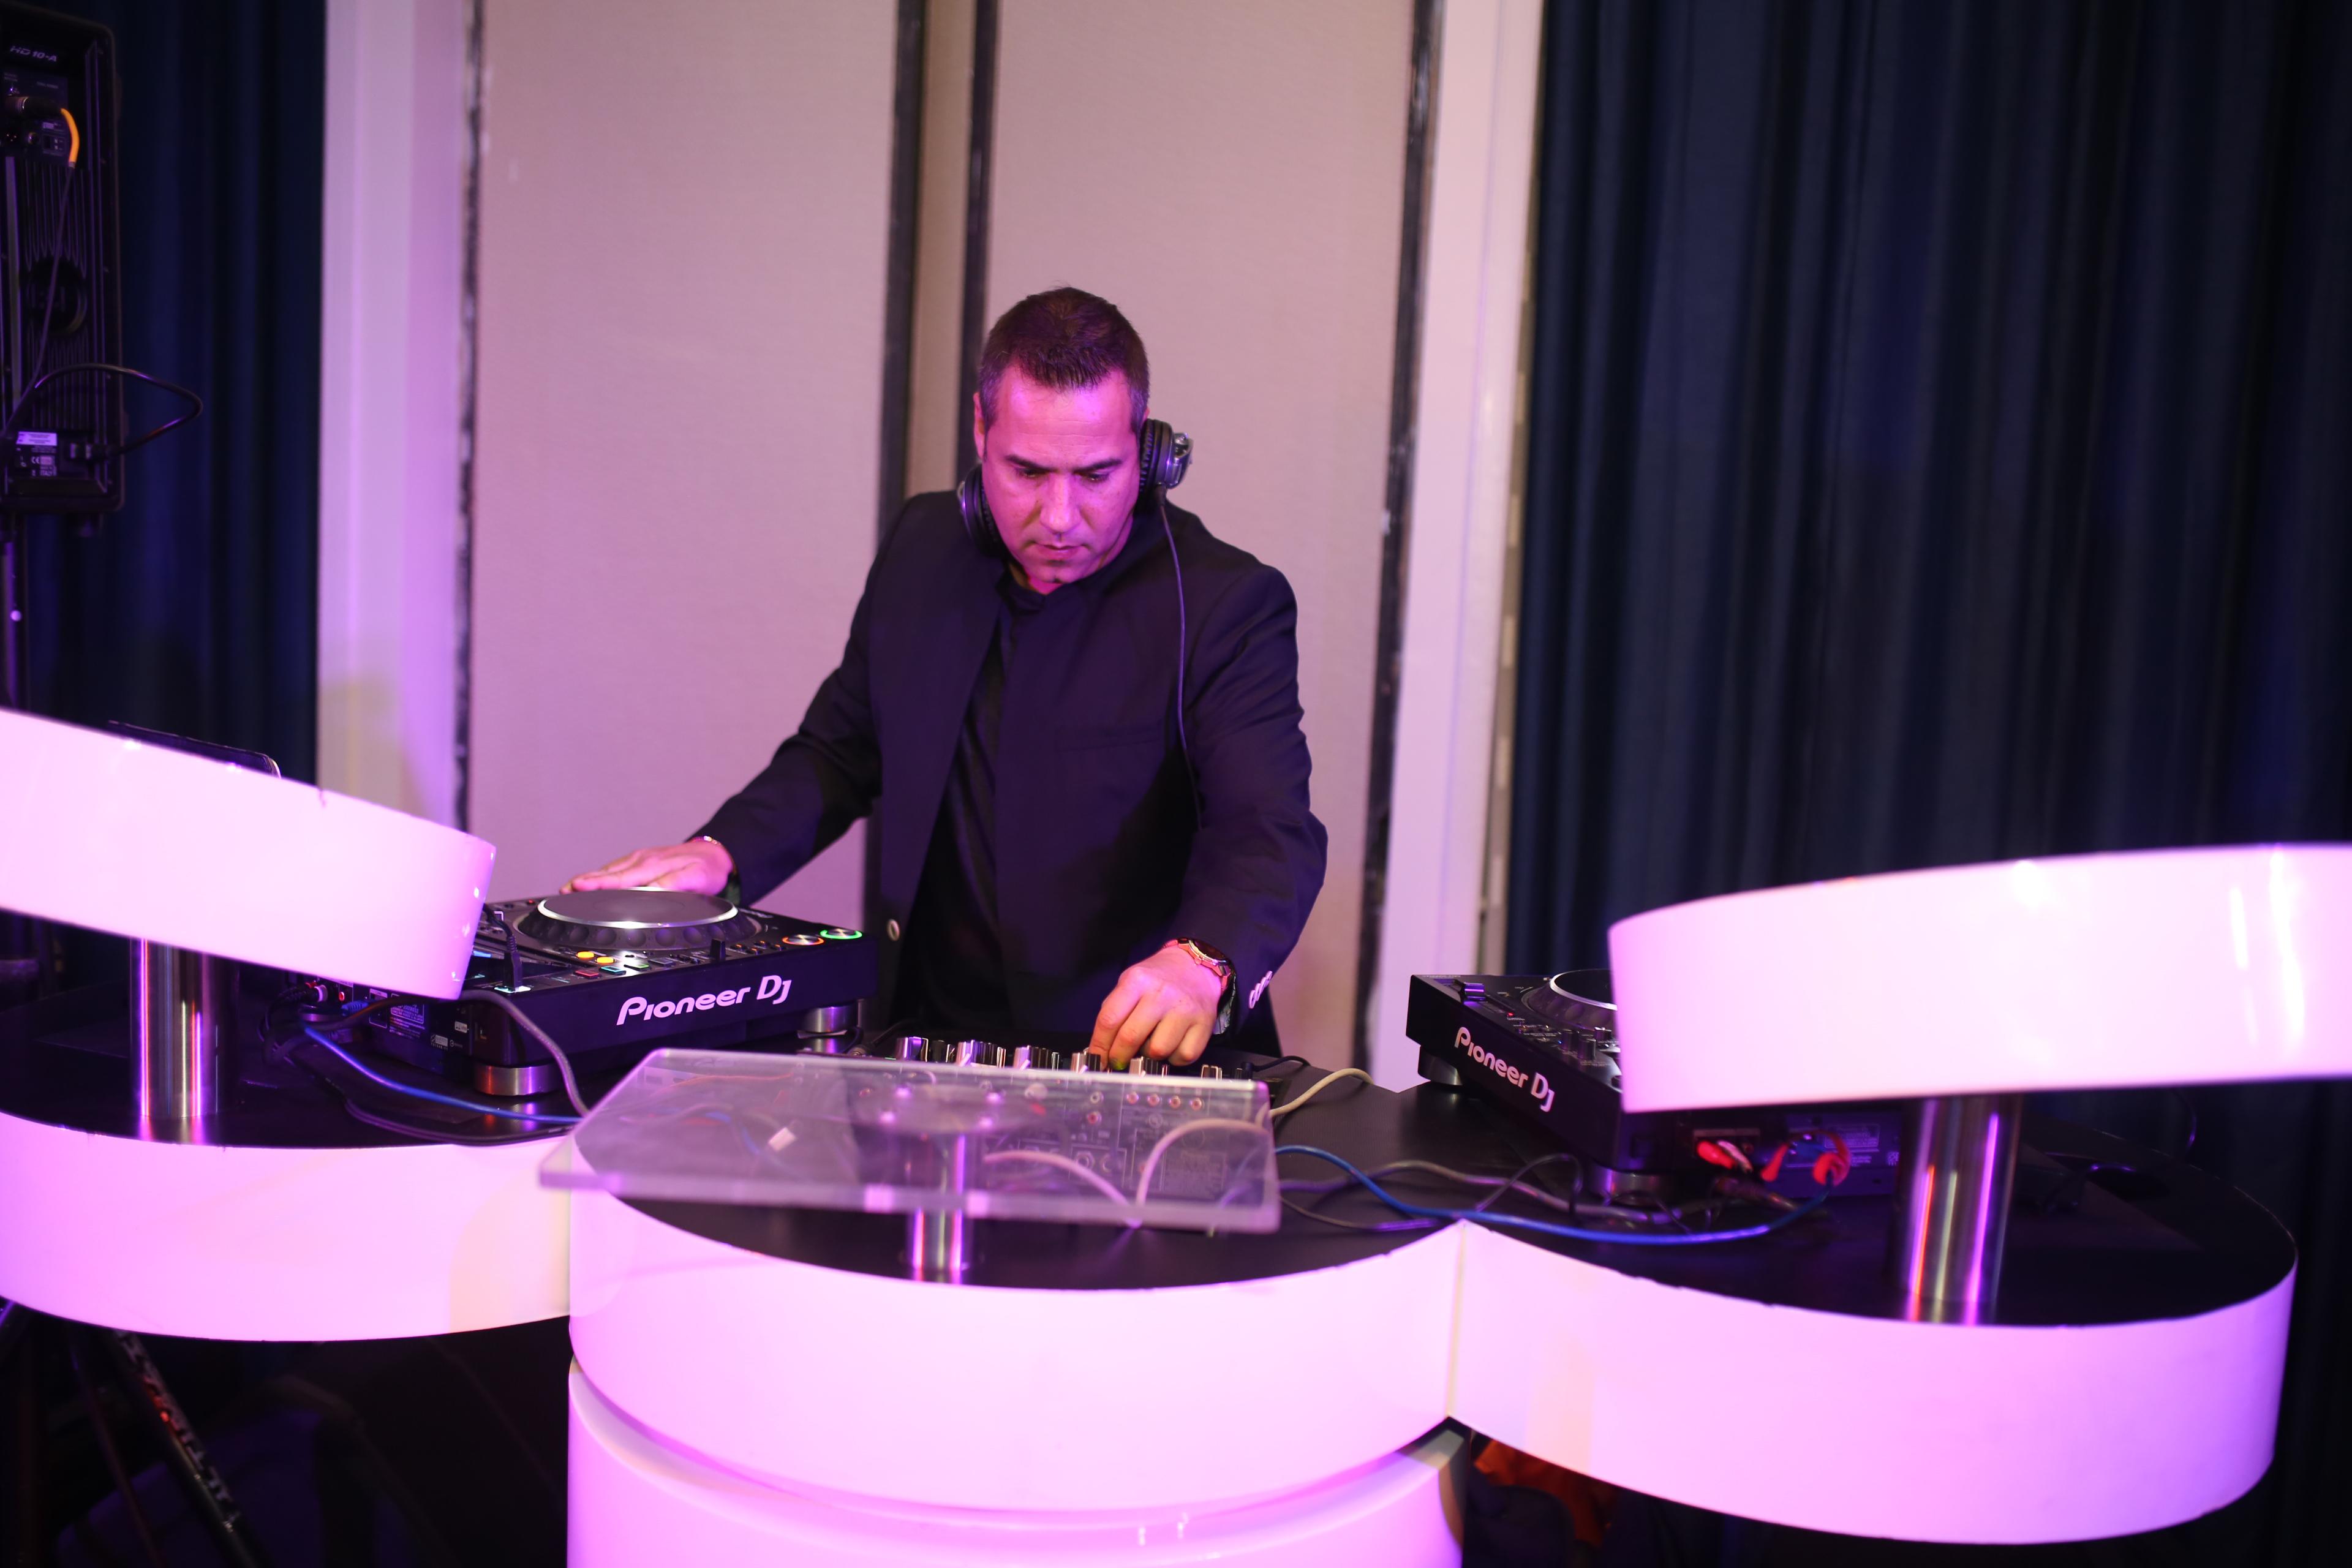 La música estuvo a cargo del DJ Iván Robles. Foto José R. Pérez Centeno.